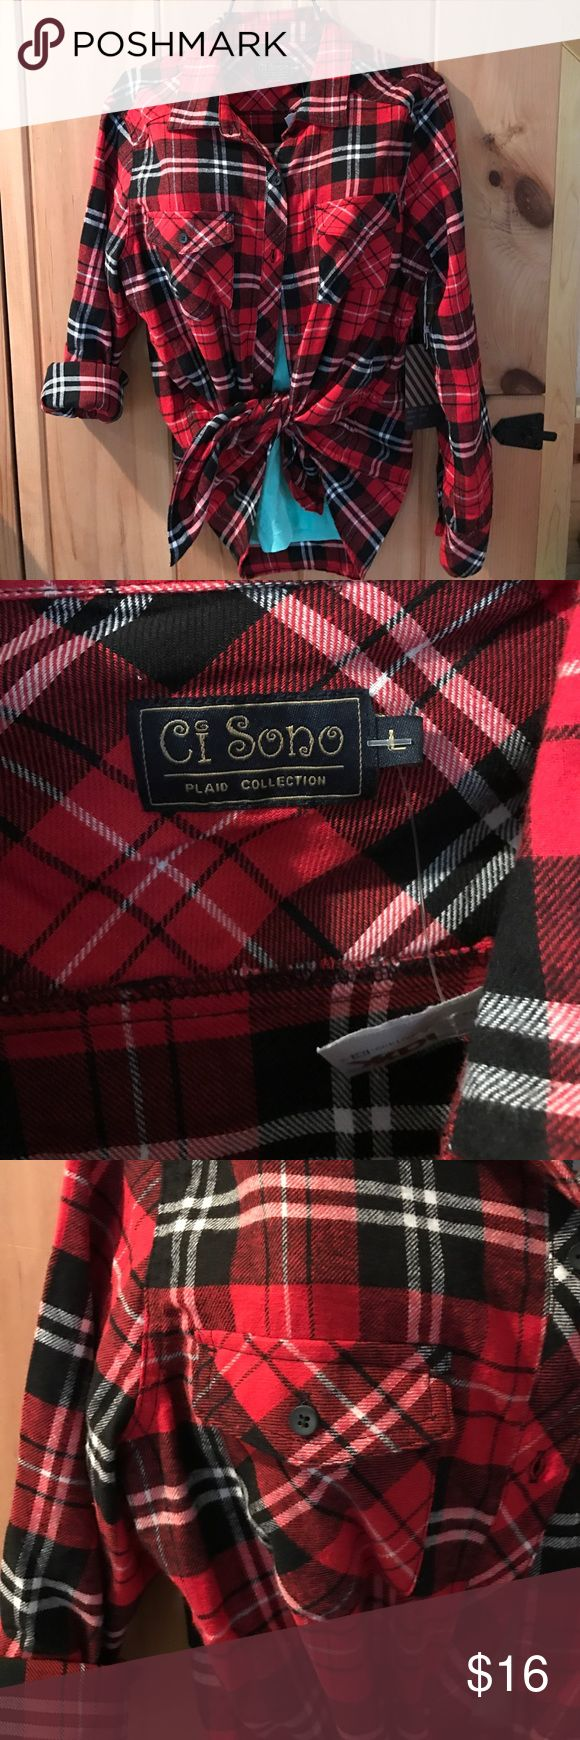 Ci Sono plaid flannel shirt. Soft classic plaid Ladies Size Large.  NWT classic red lumberjack plaid.  Wear it like a shirt or a jacket. Ci Sono Tops Button Down Shirts